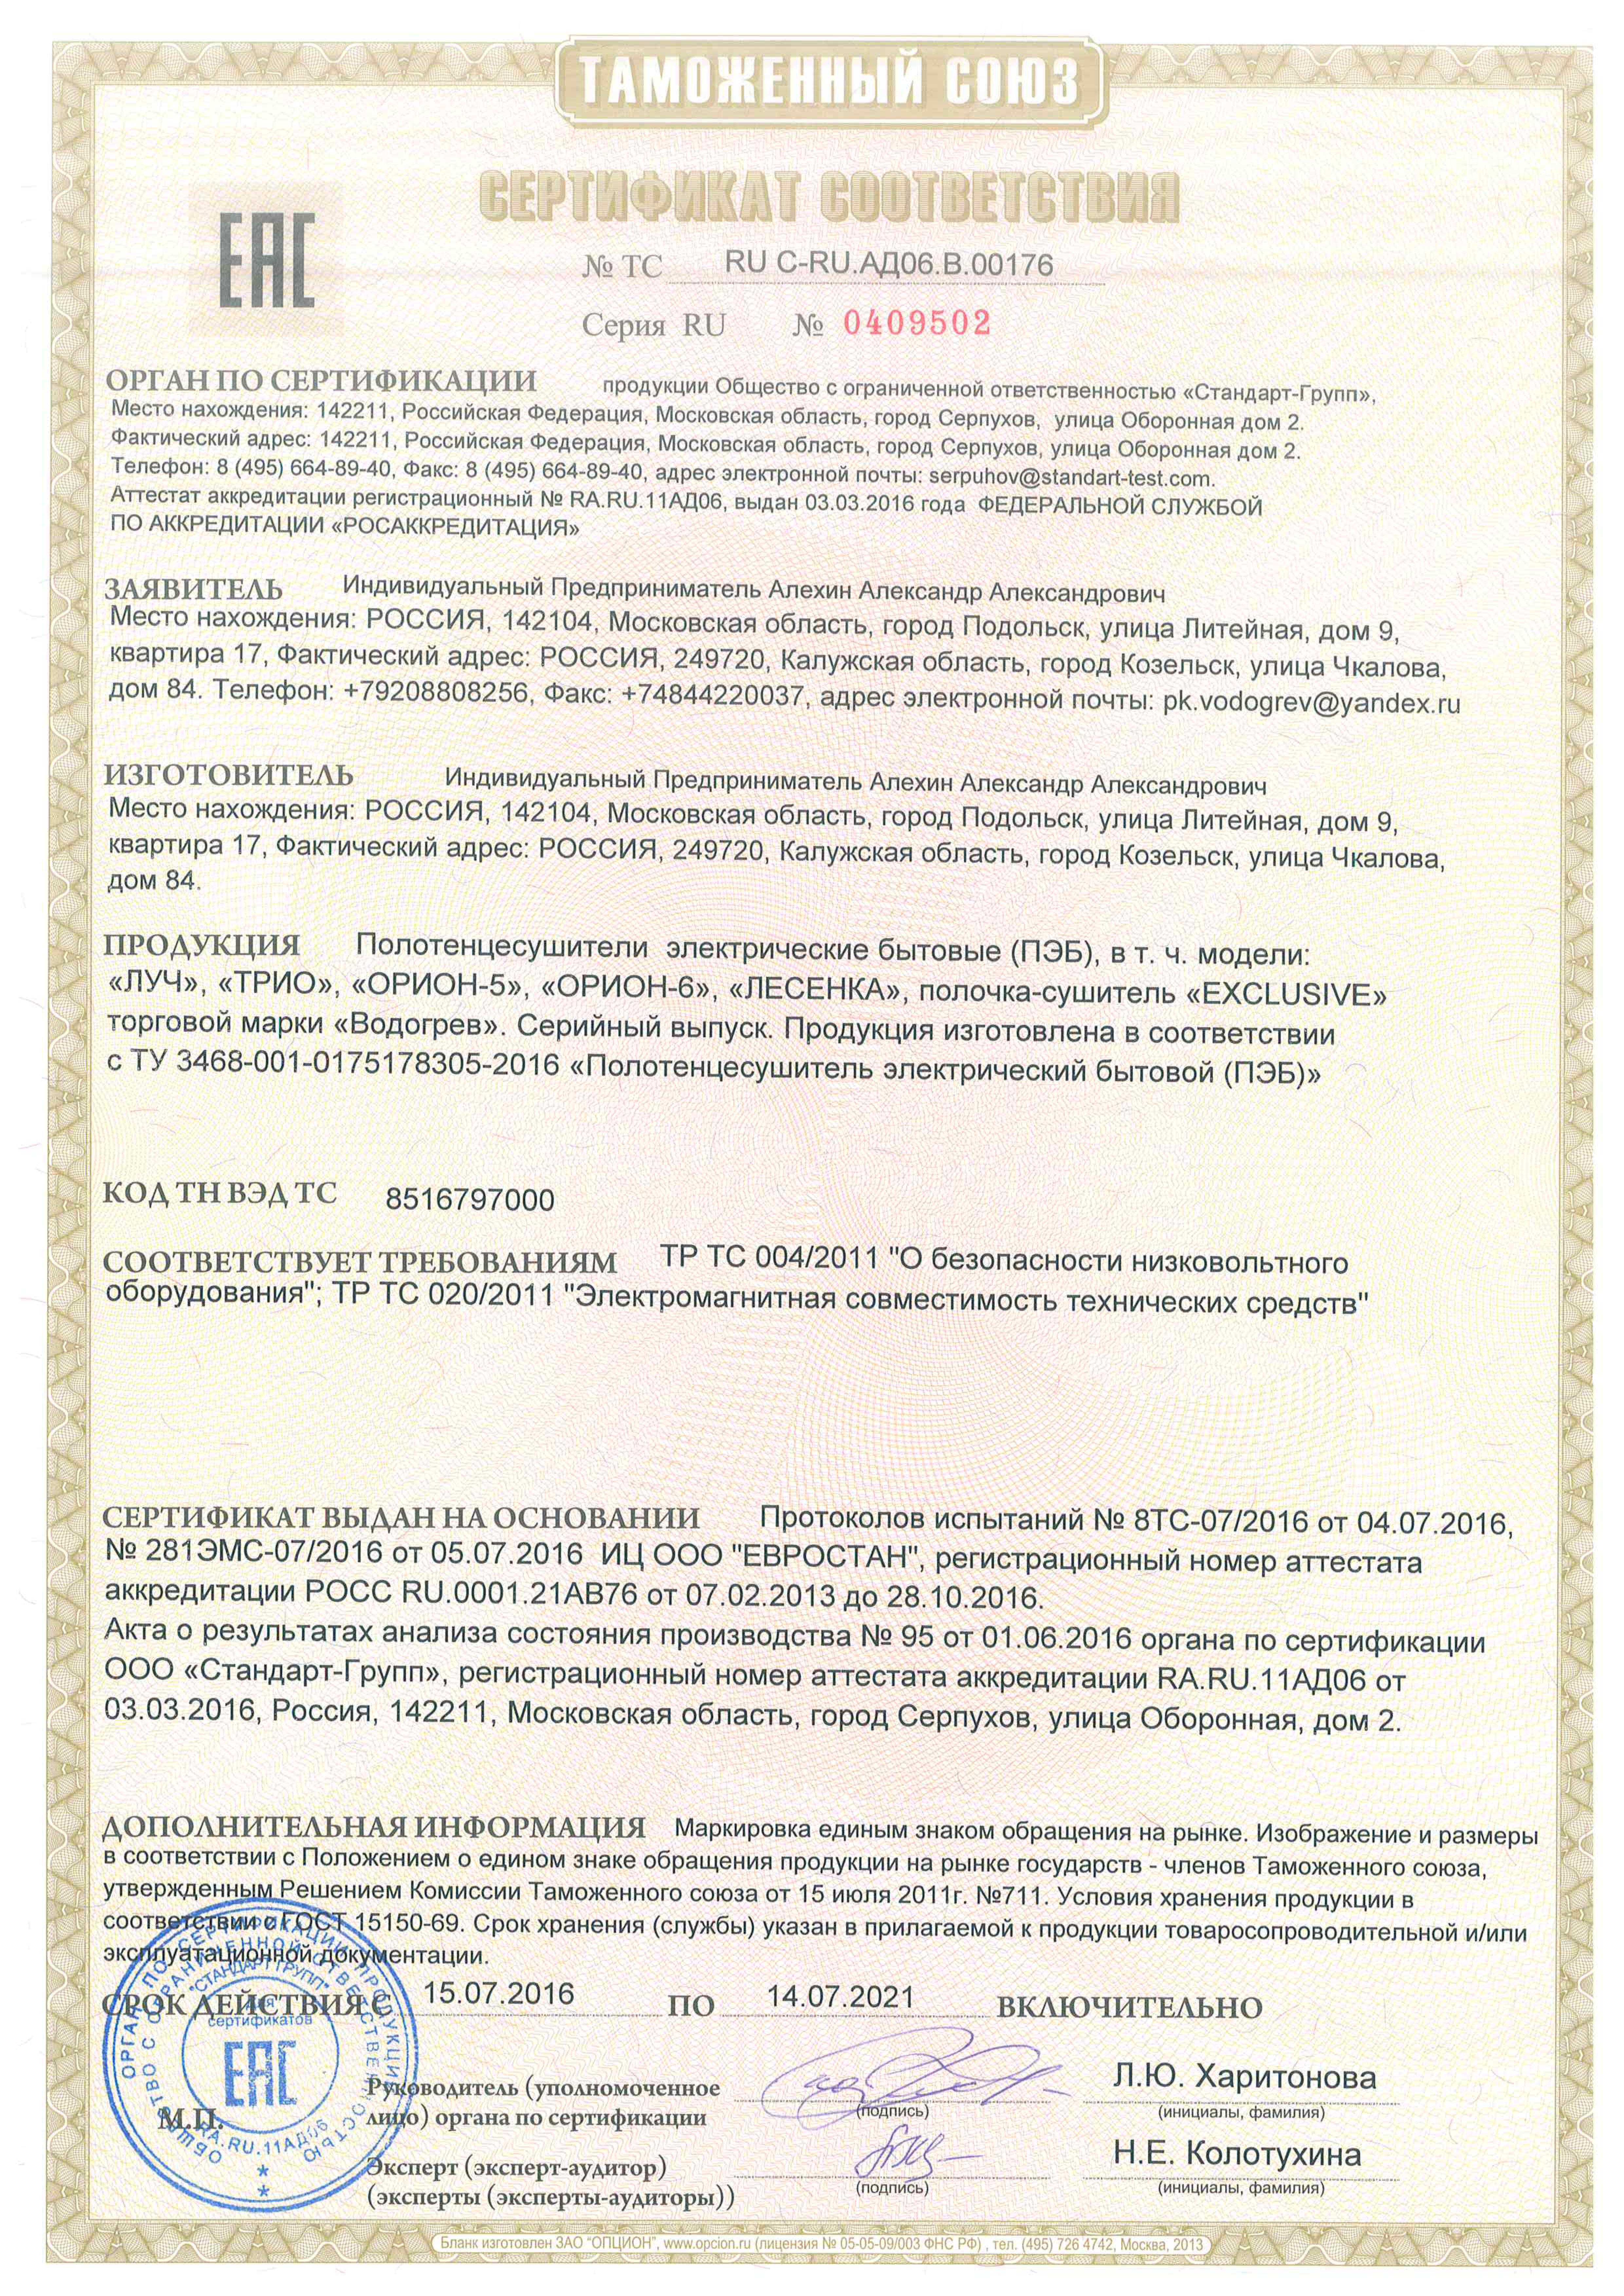 Сертификат соответствия на электрические полотенцесушители